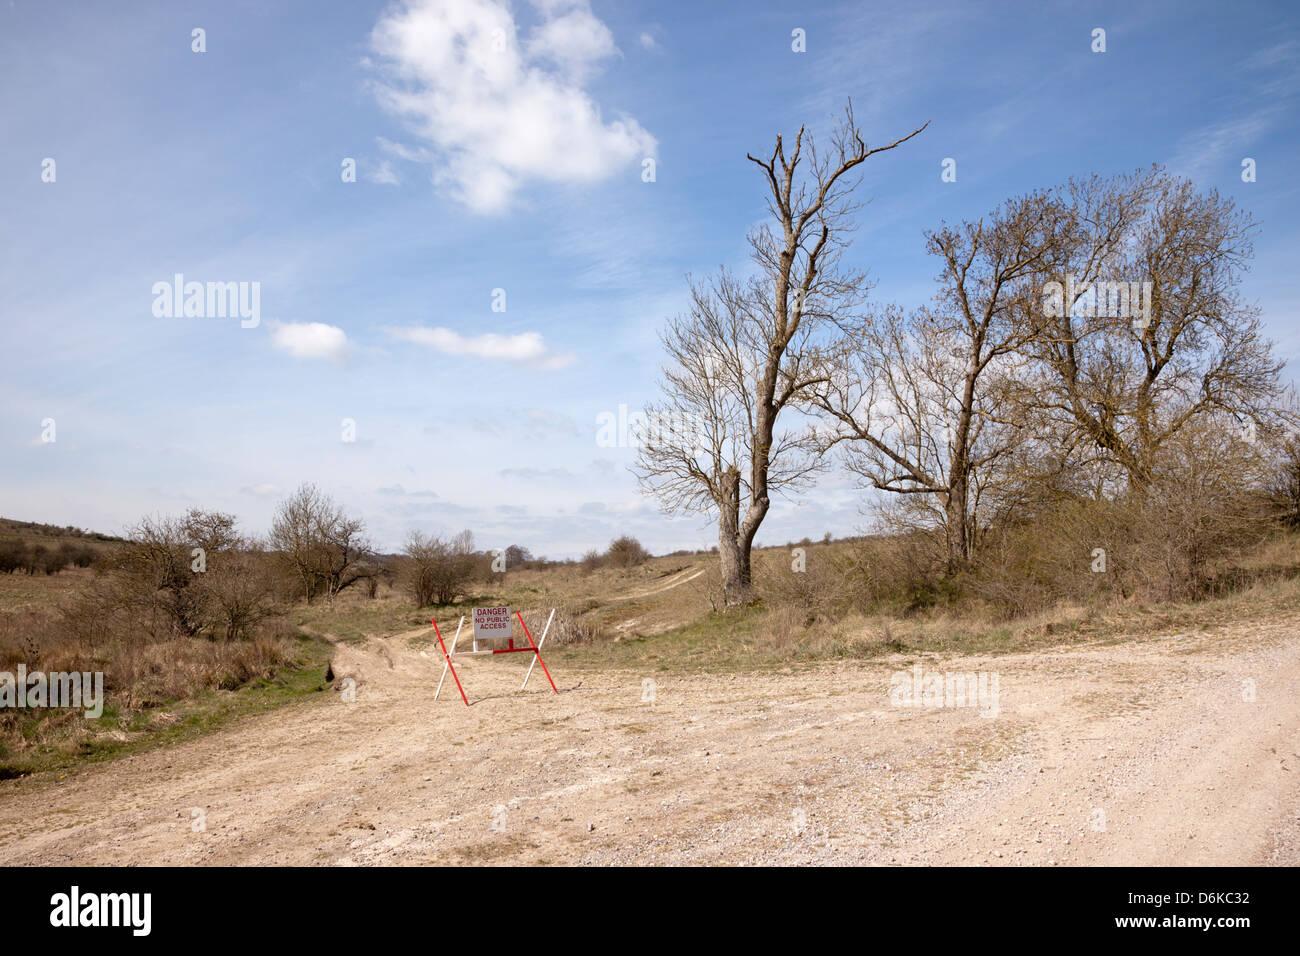 Salisbury Plain, Wiltshire, England - Stock Image